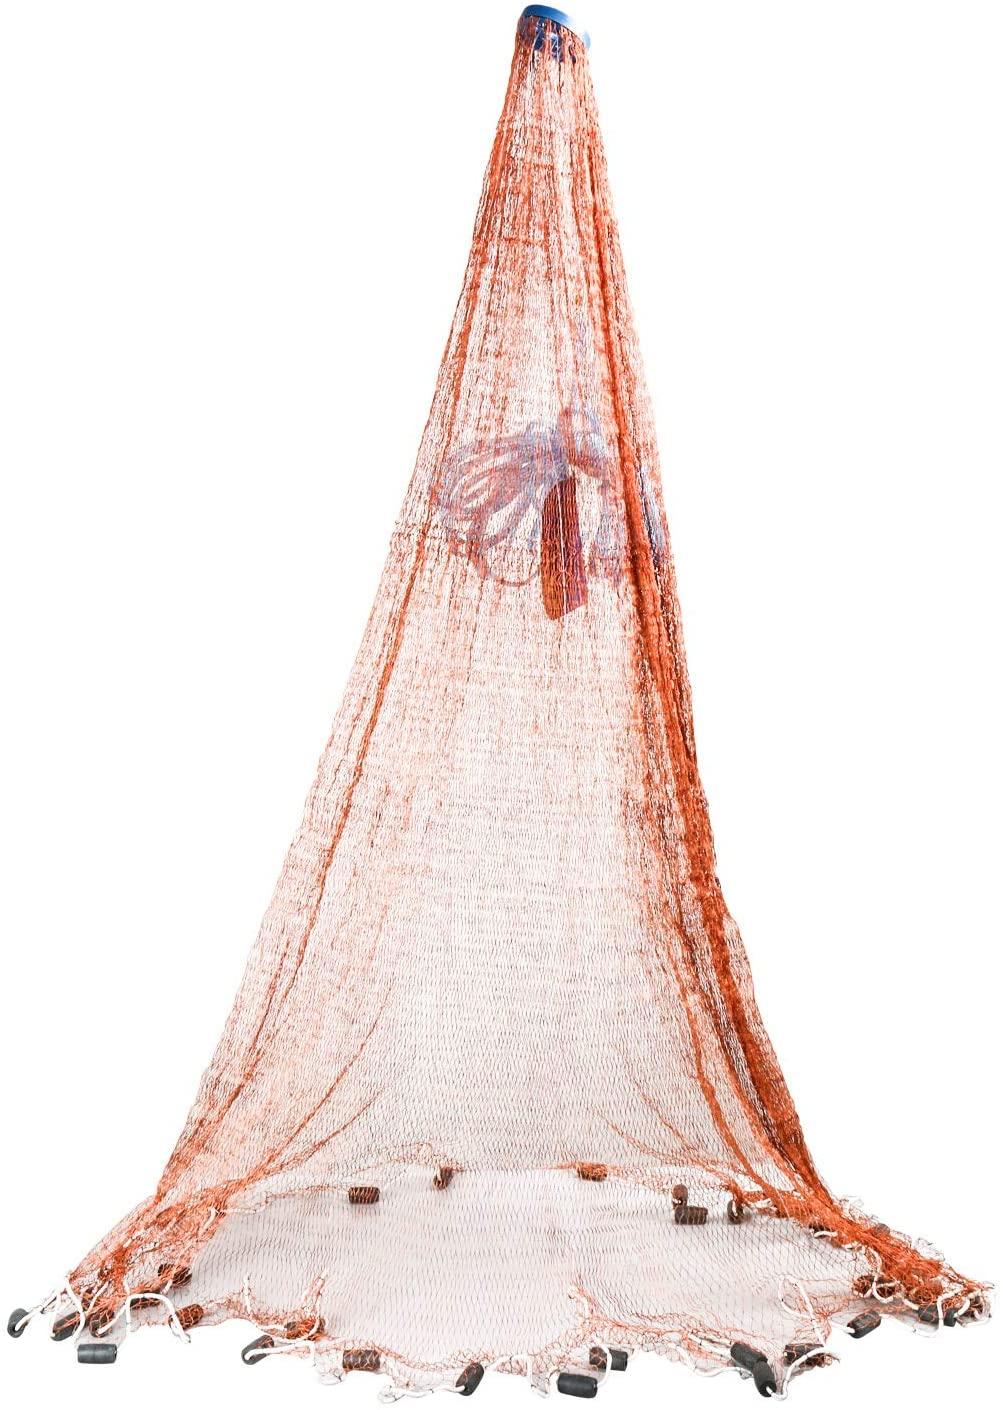 YaeGarden Saltwater Fishing Cast Net Fish Net Fishing Throw Net Bait Trap Fishing Net 4ft/6ft/8ft/10ft/12ft Radius with Environmental-Friendly Material Sinker Brown